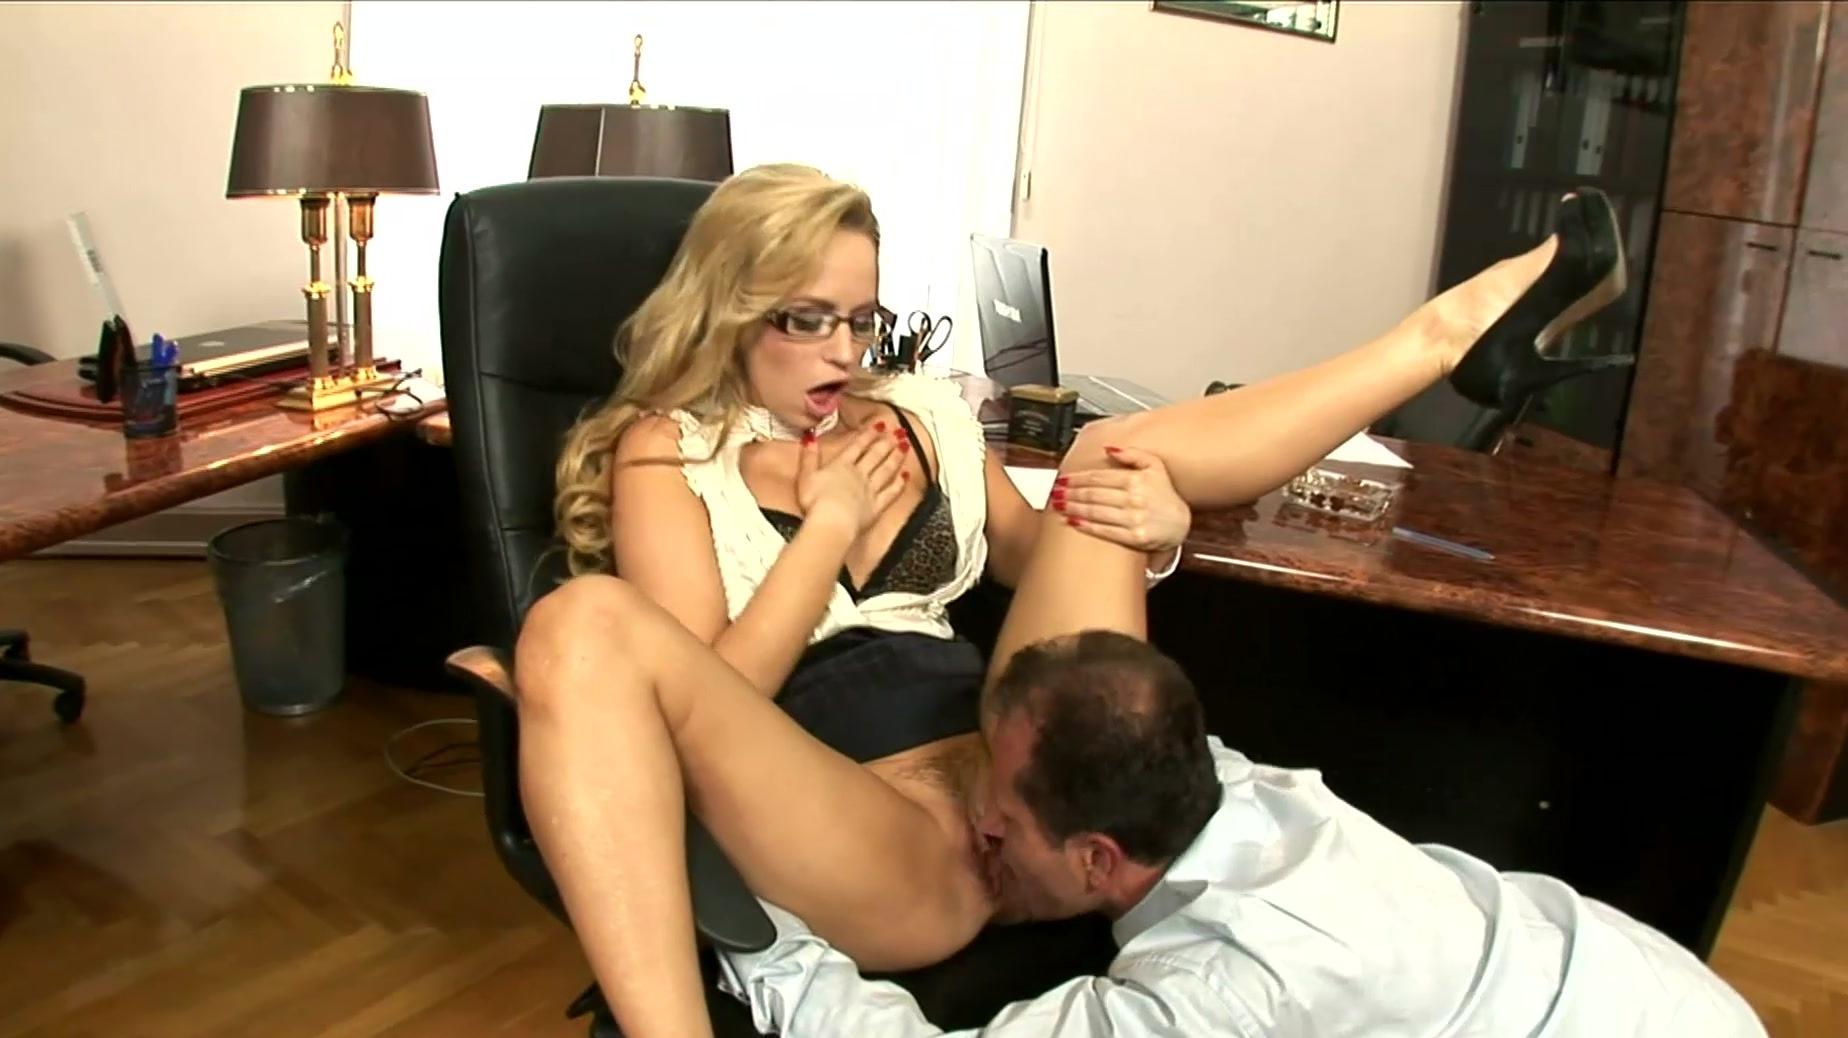 domashnee-seks-prikazala-podchinennomu-vilezat-v-ofise-pizdu-telki